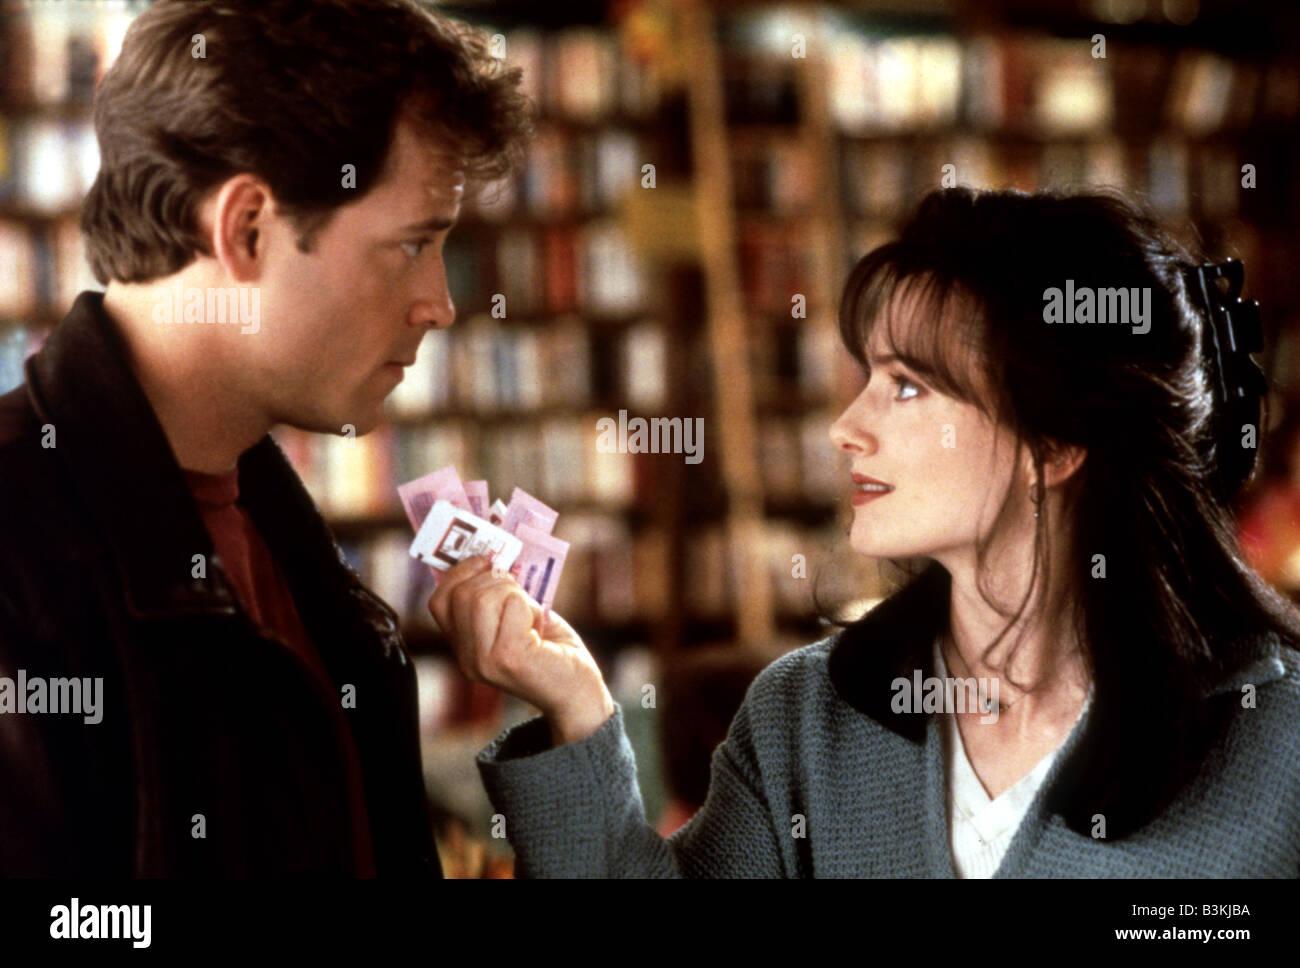 LIEBER Gott 1996 Paramount Film mit Greg Kinnear Stockbild